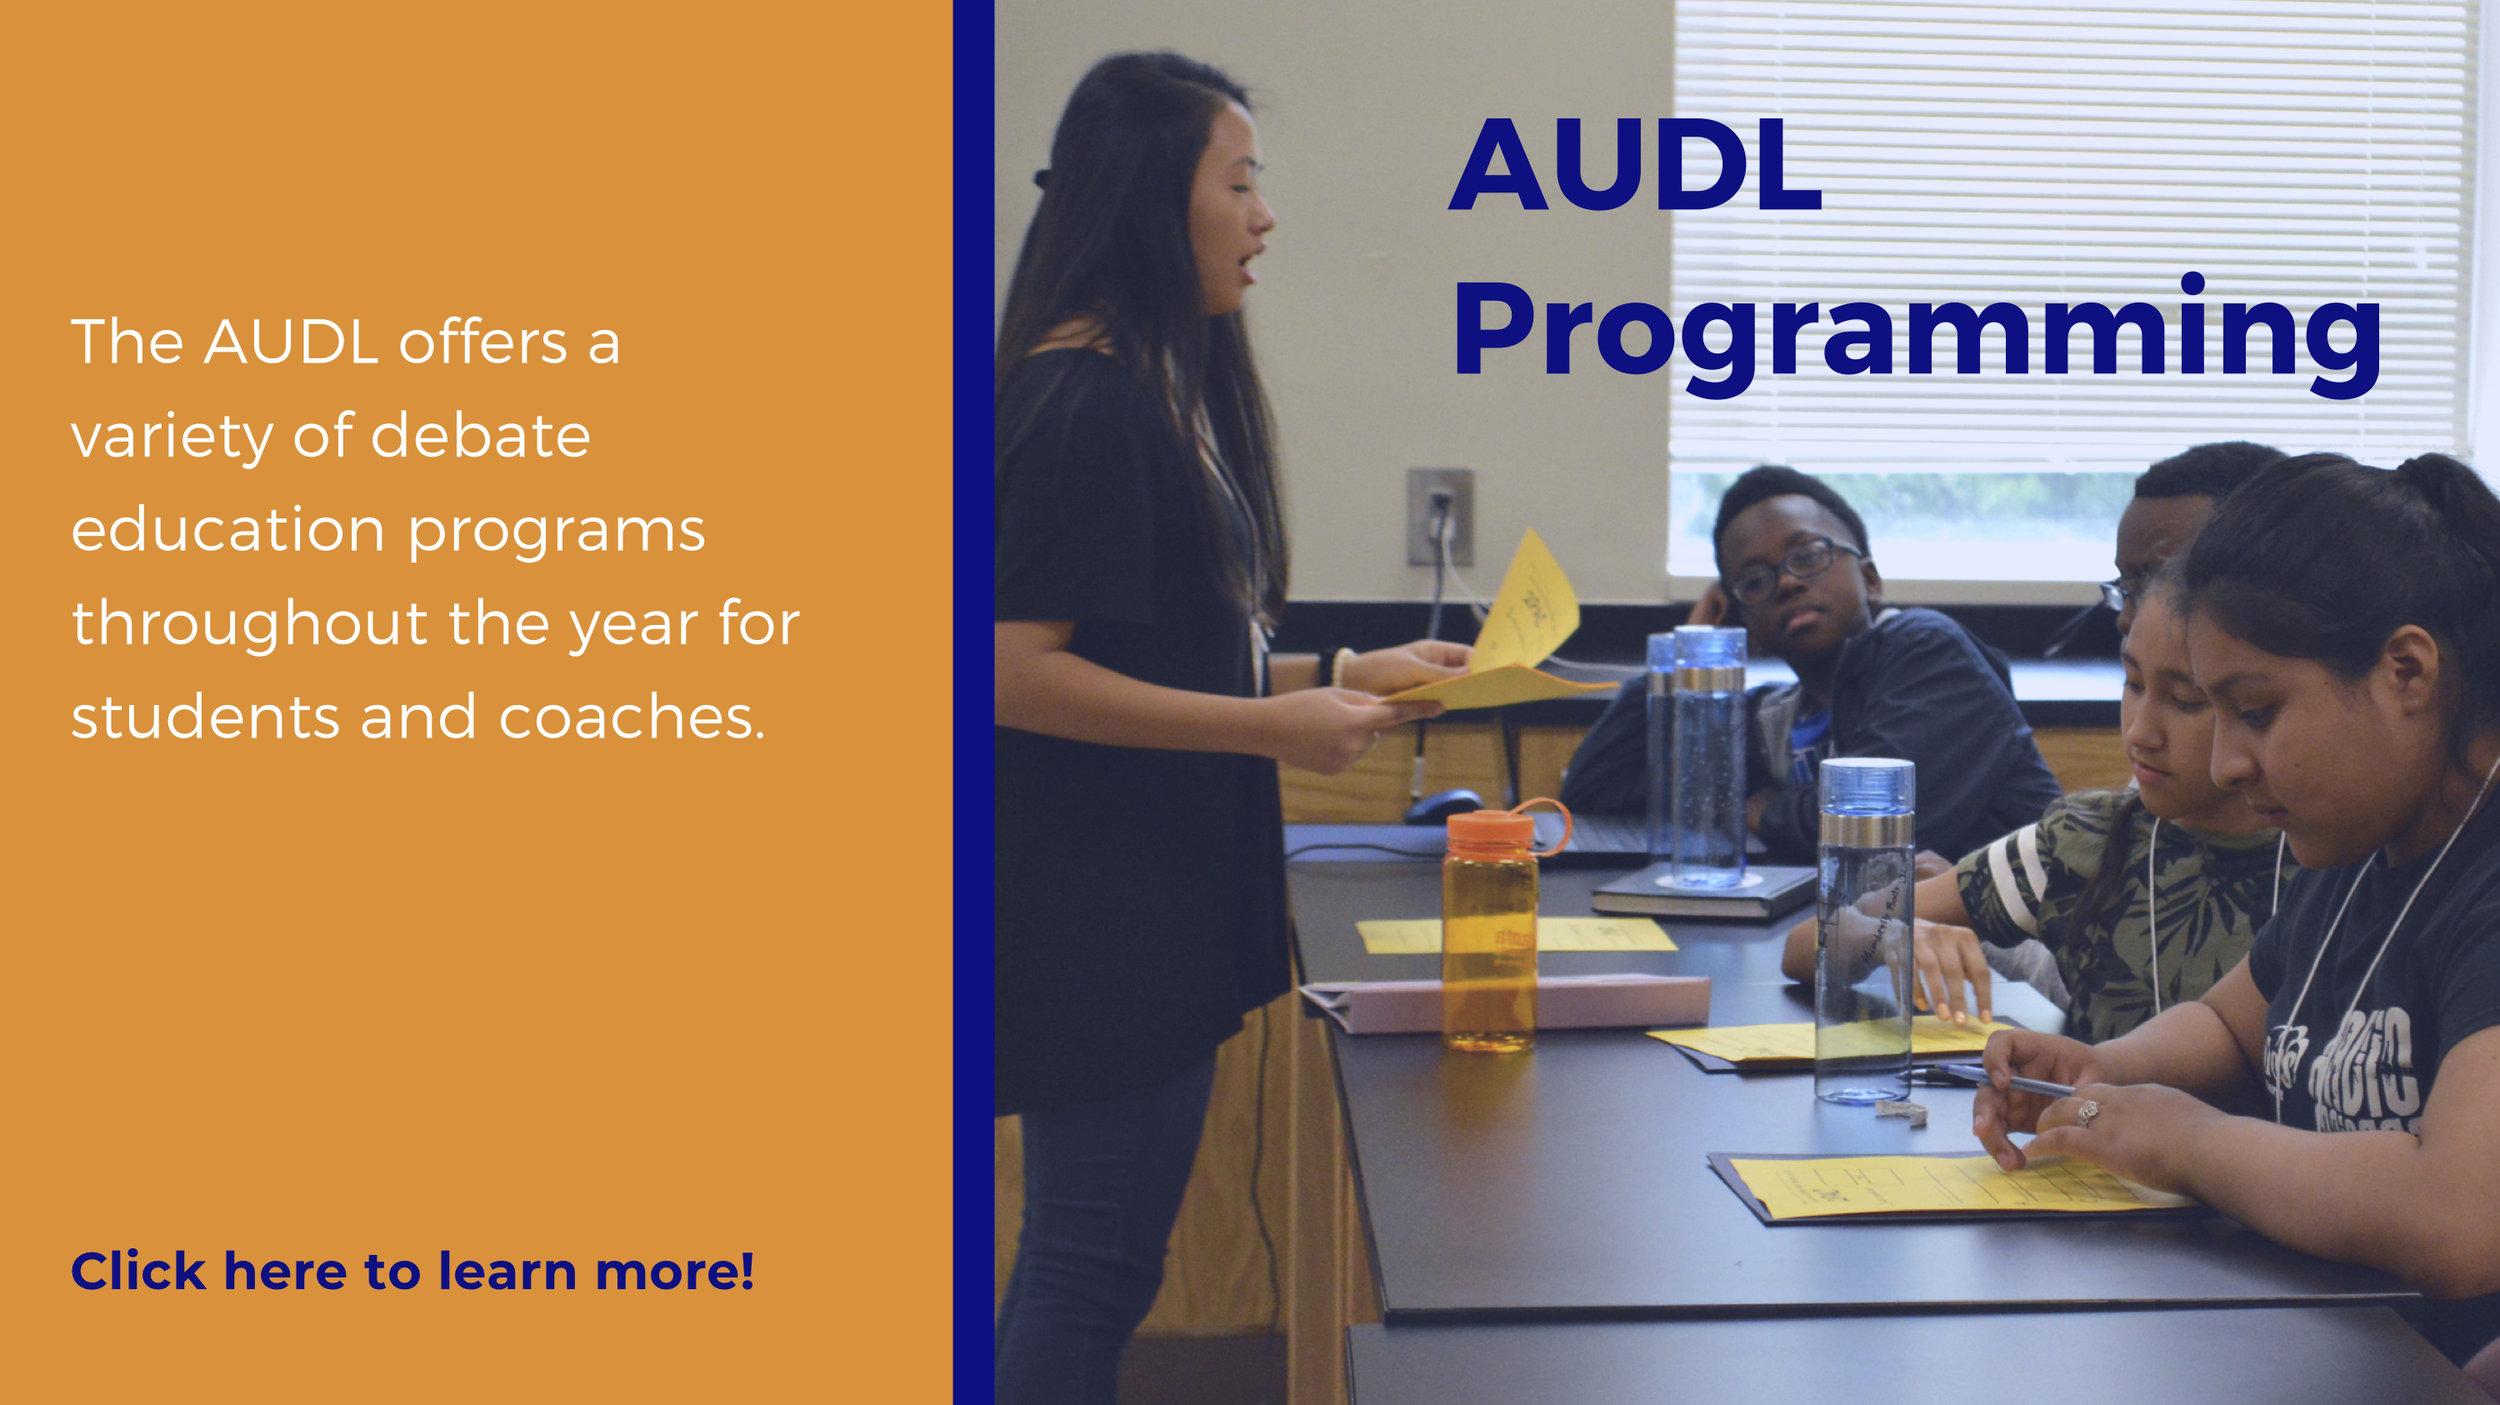 AUDL Homepage Slideshow - Programming.jpg